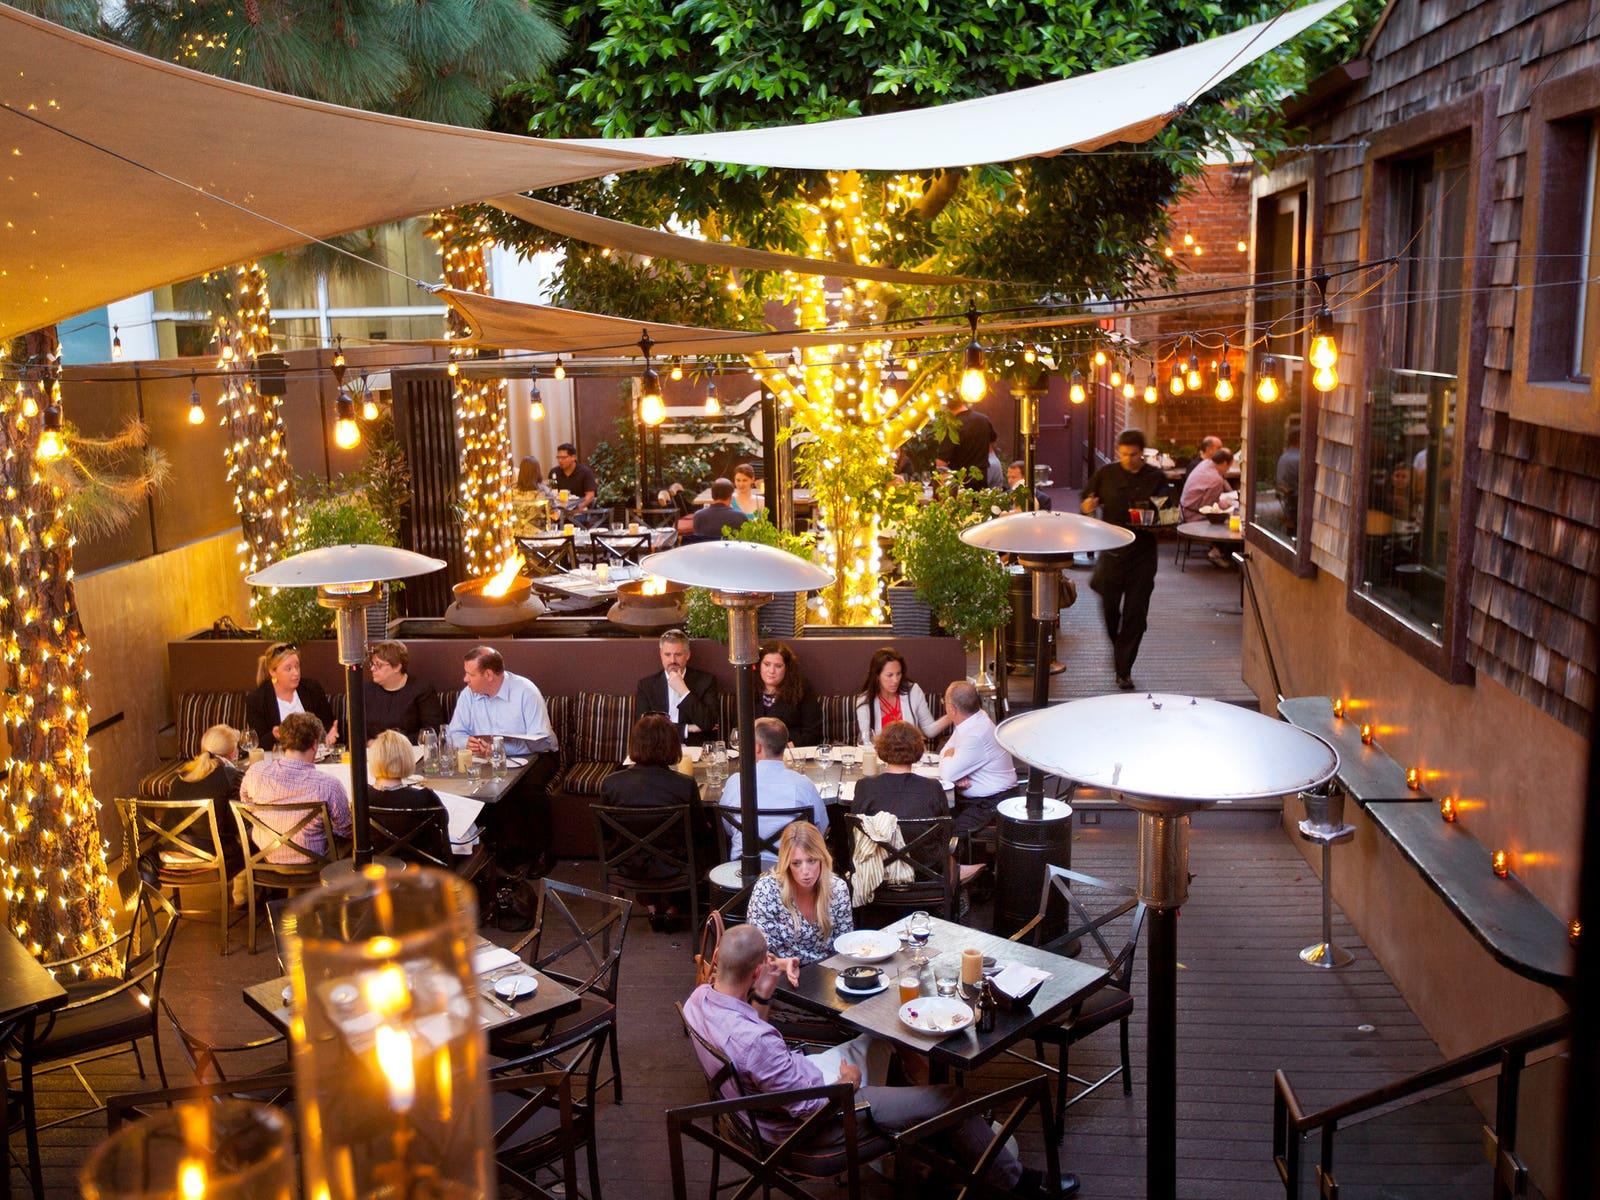 Wilshire Restaurant Santa Monica Patio